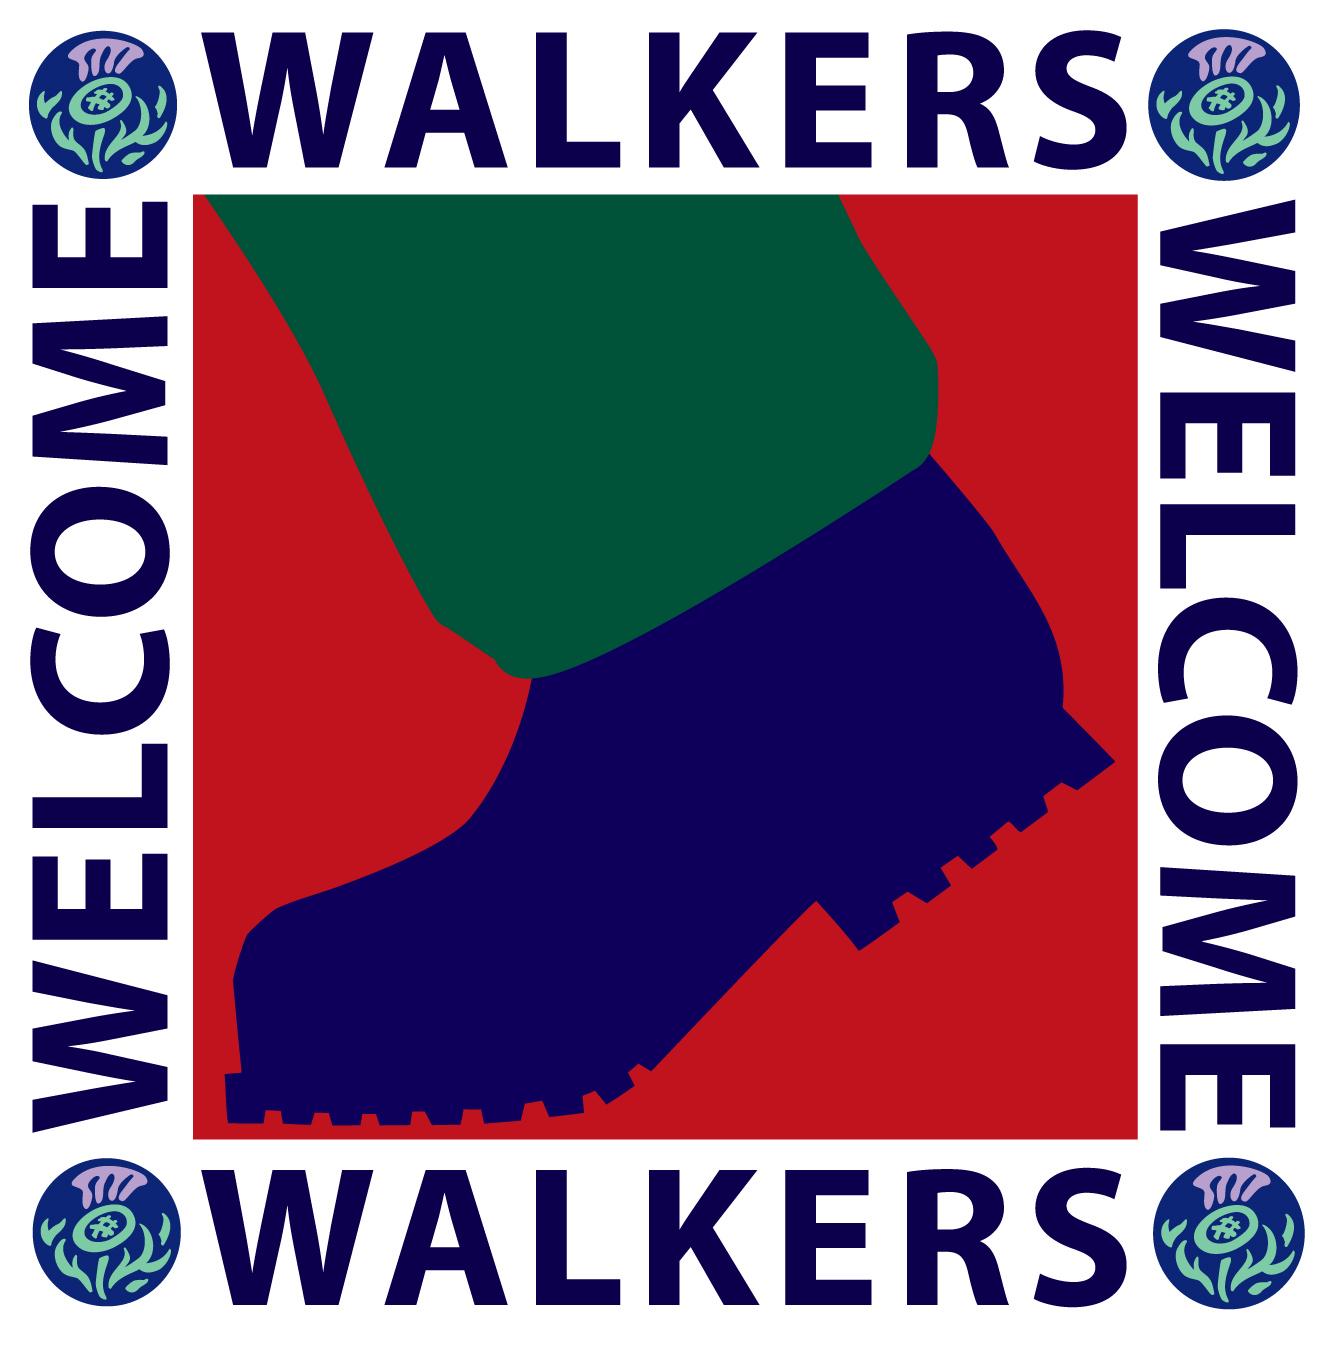 Walkers_Welcome_Logo.jpg